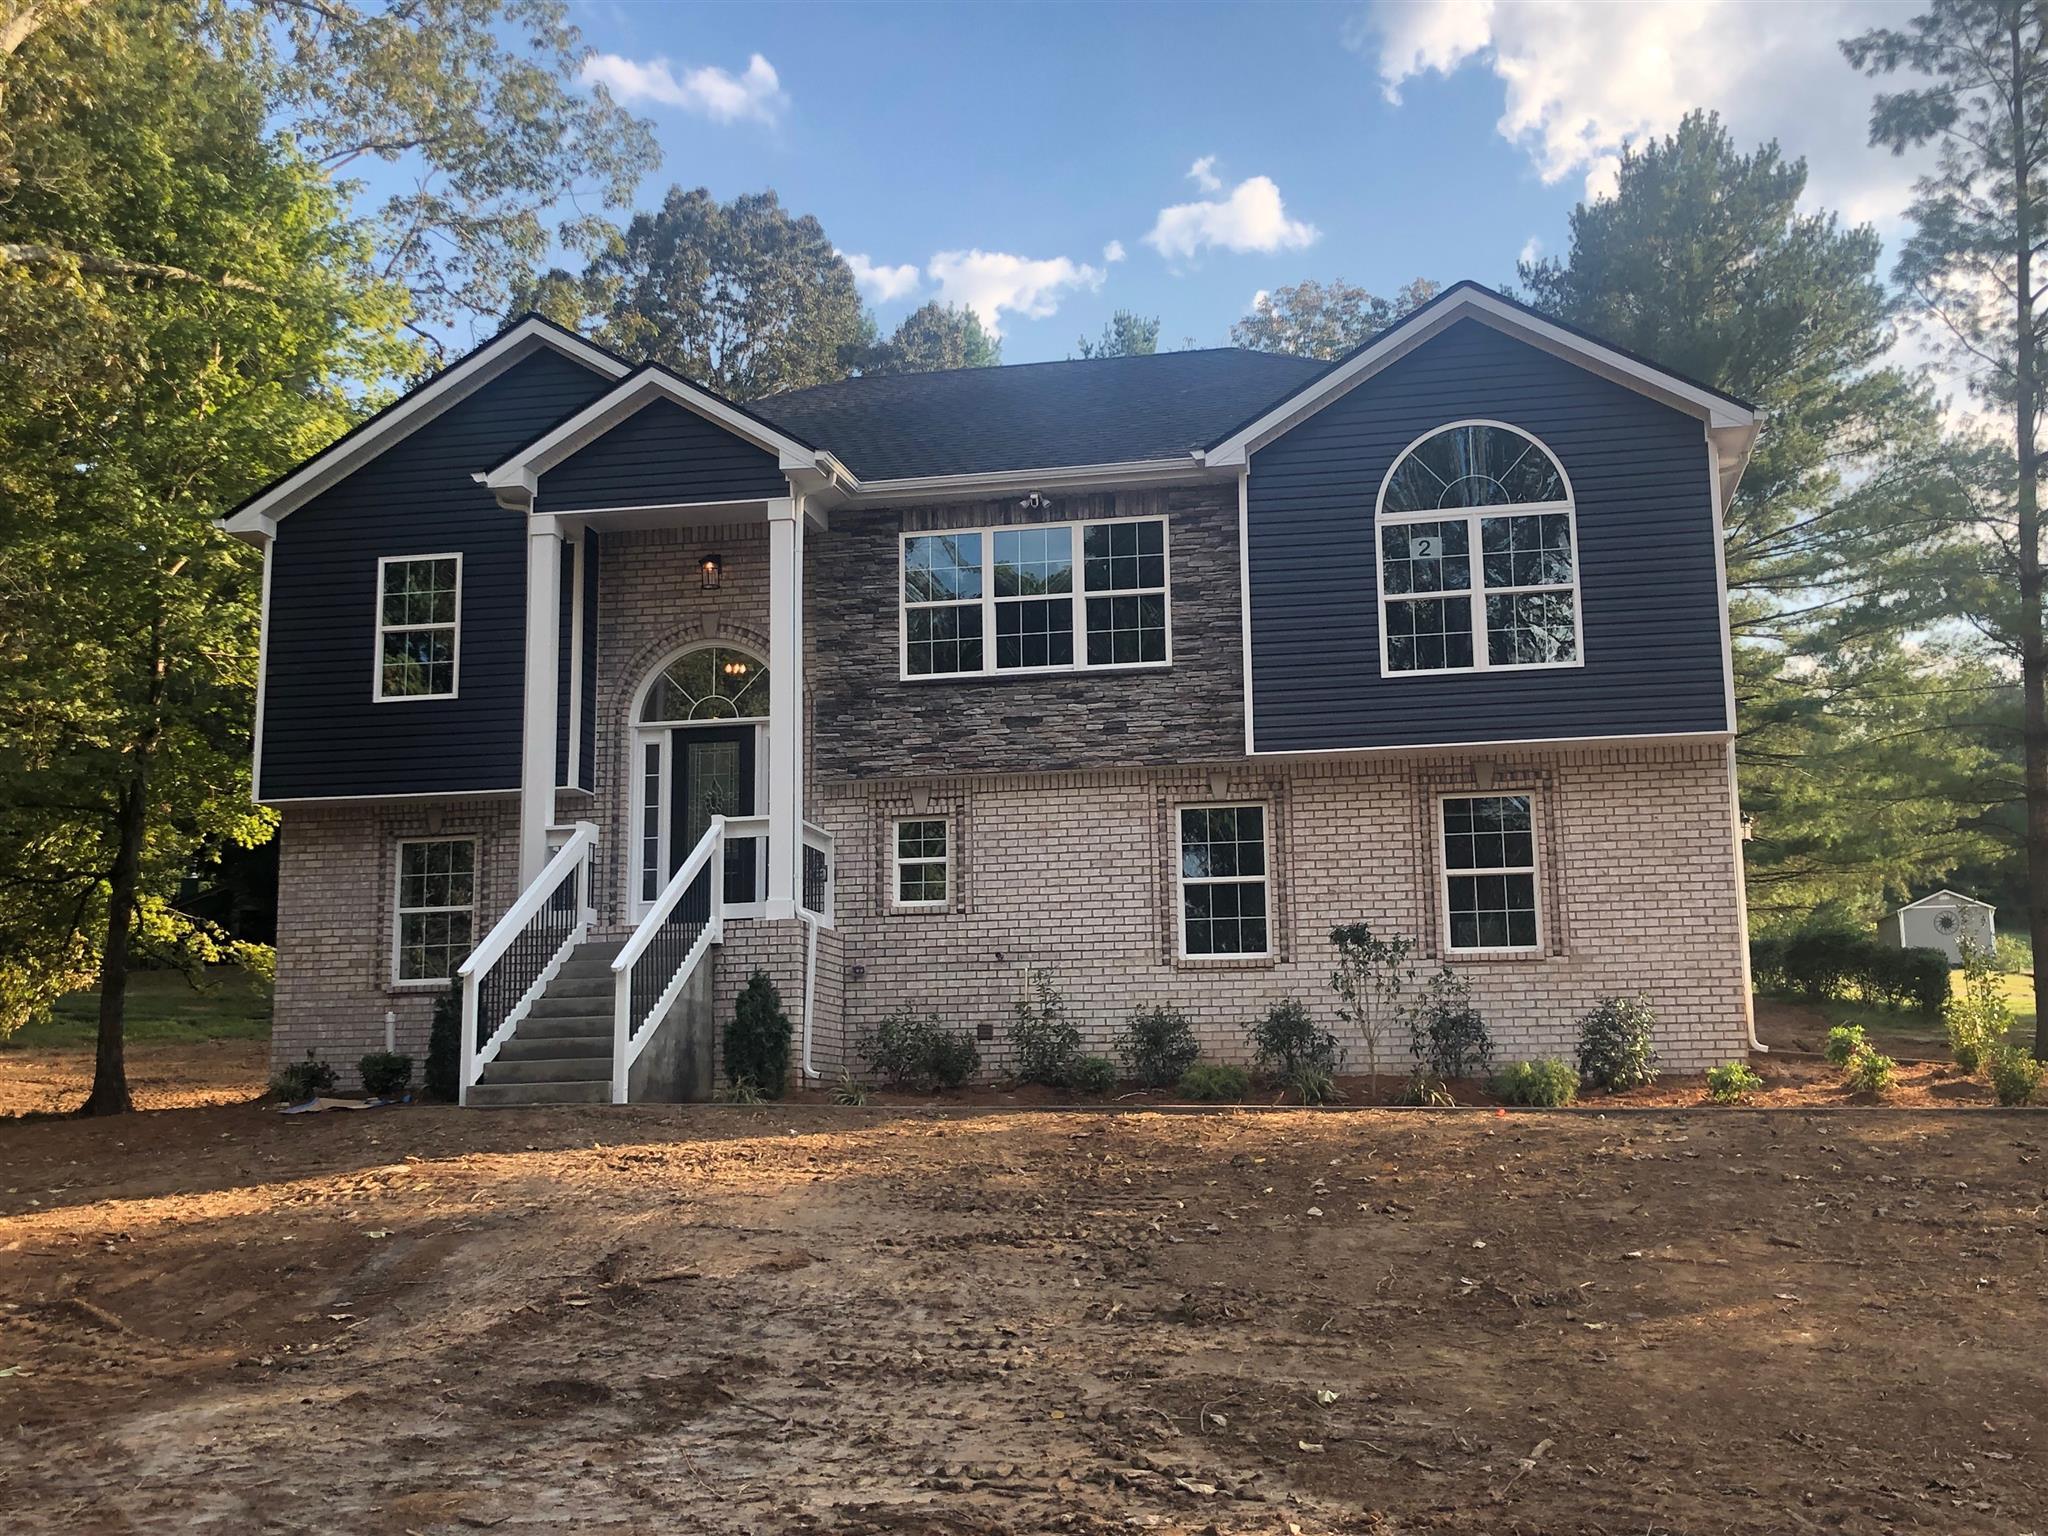 2 Salem Rd, Clarksville, TN 37040 - Clarksville, TN real estate listing